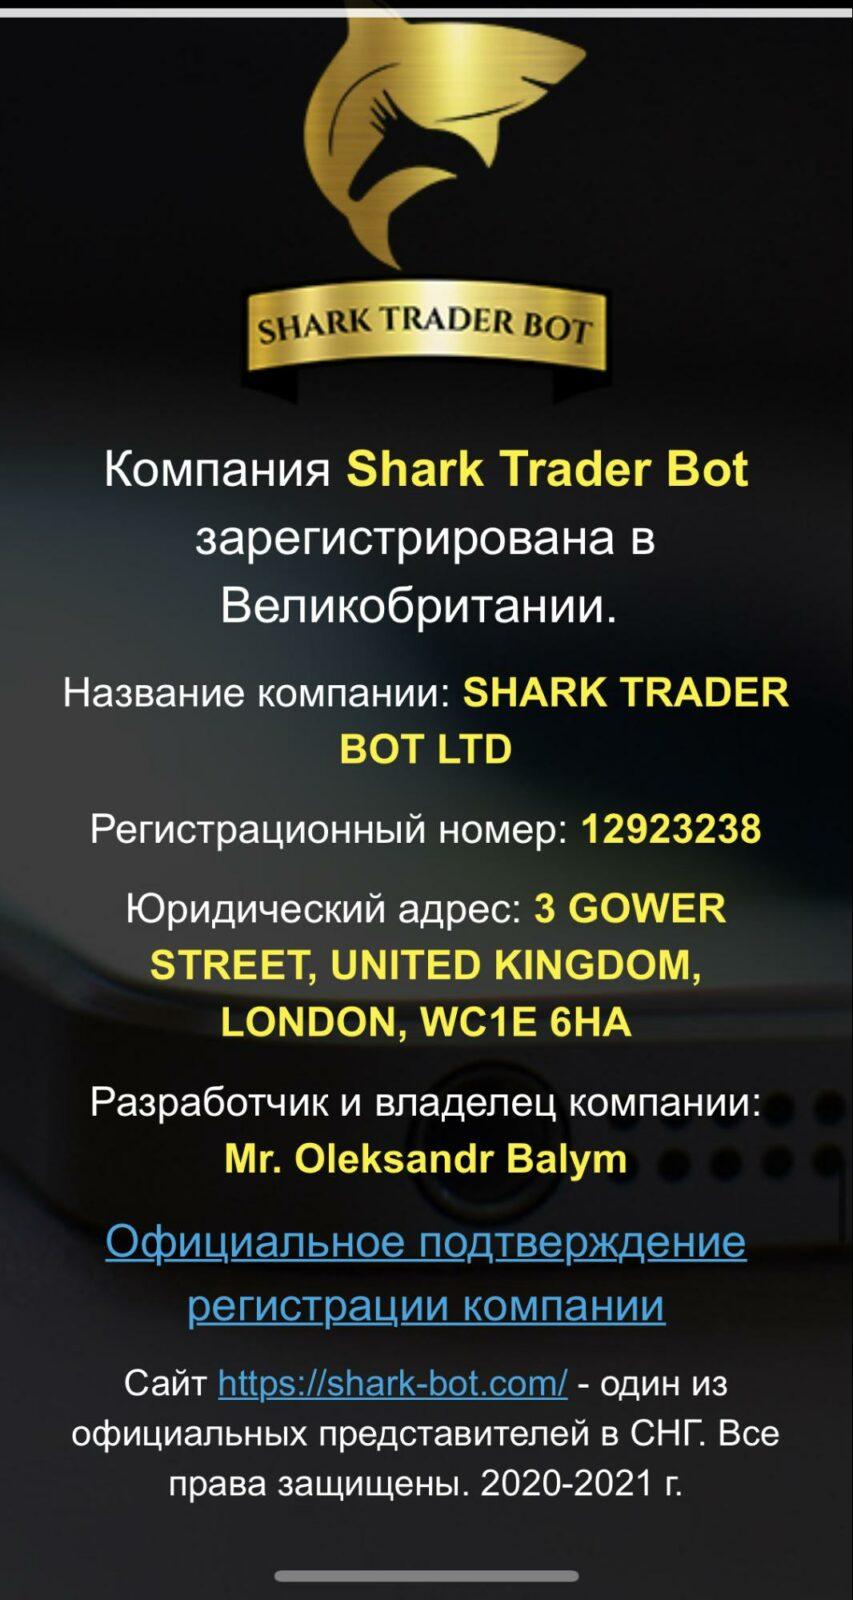 Компания Shark Trader Bot